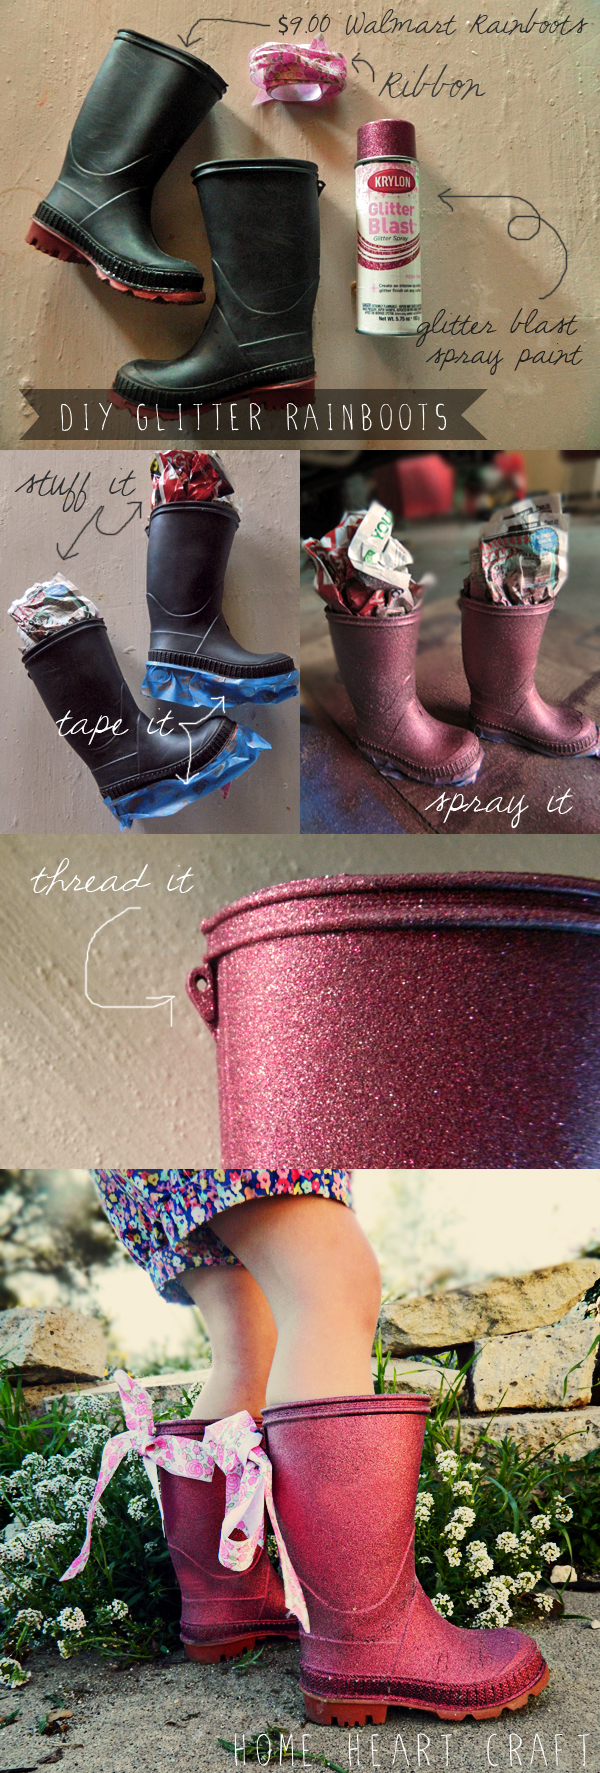 diy glitter rainboots kid how to 2